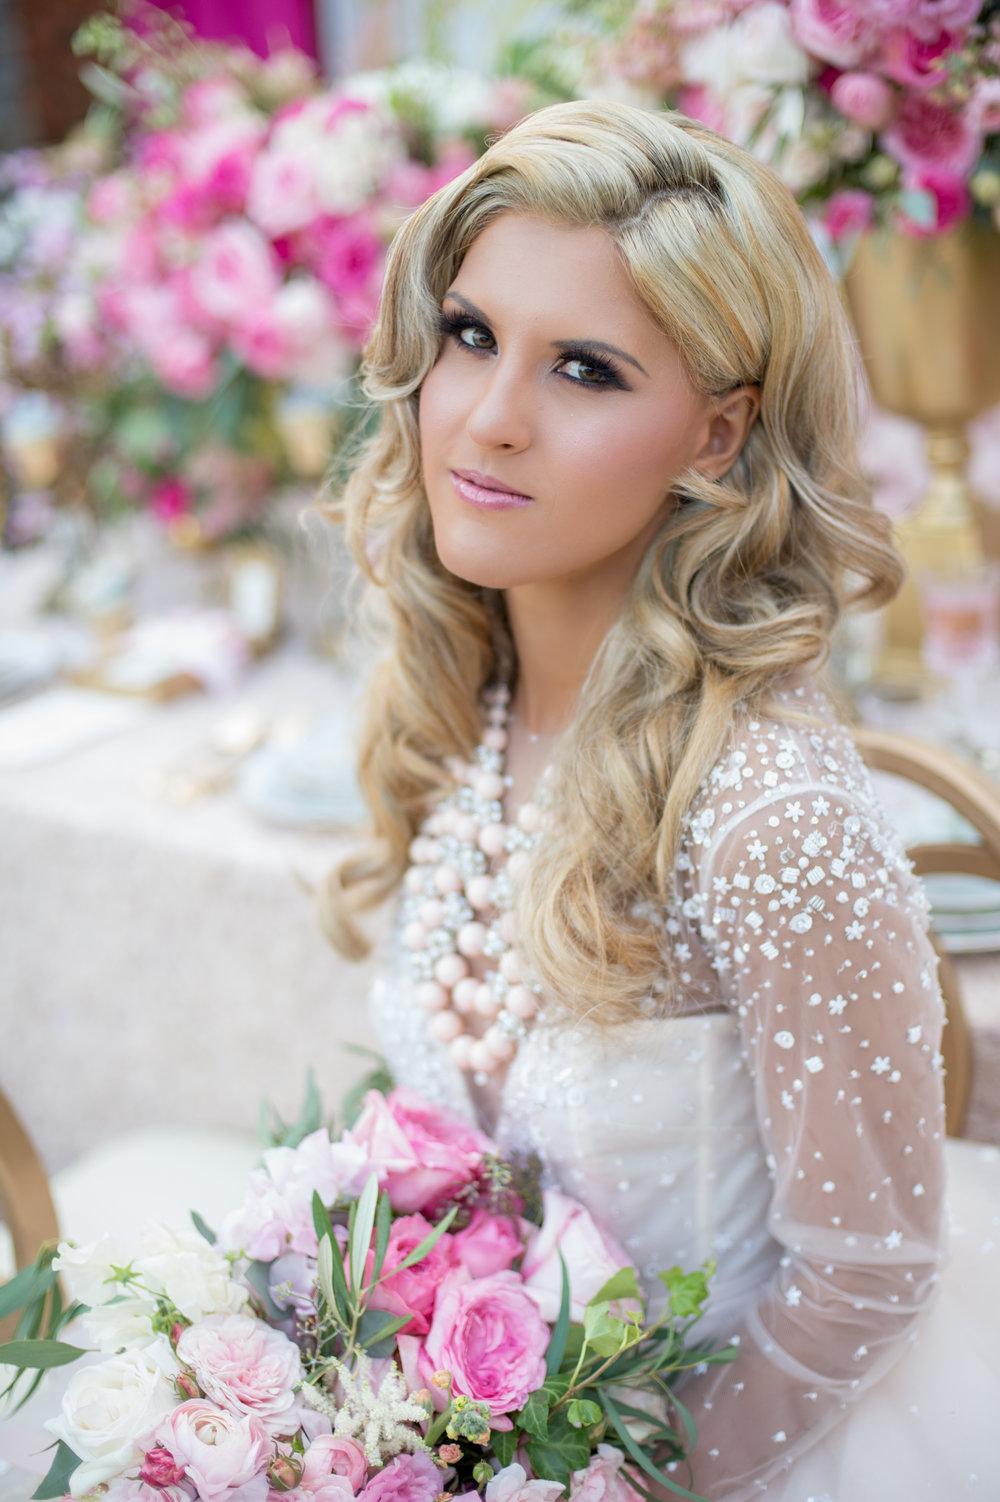 makeup-worx-mobile-wedding- makeup-hair-hamilton-11.jpg